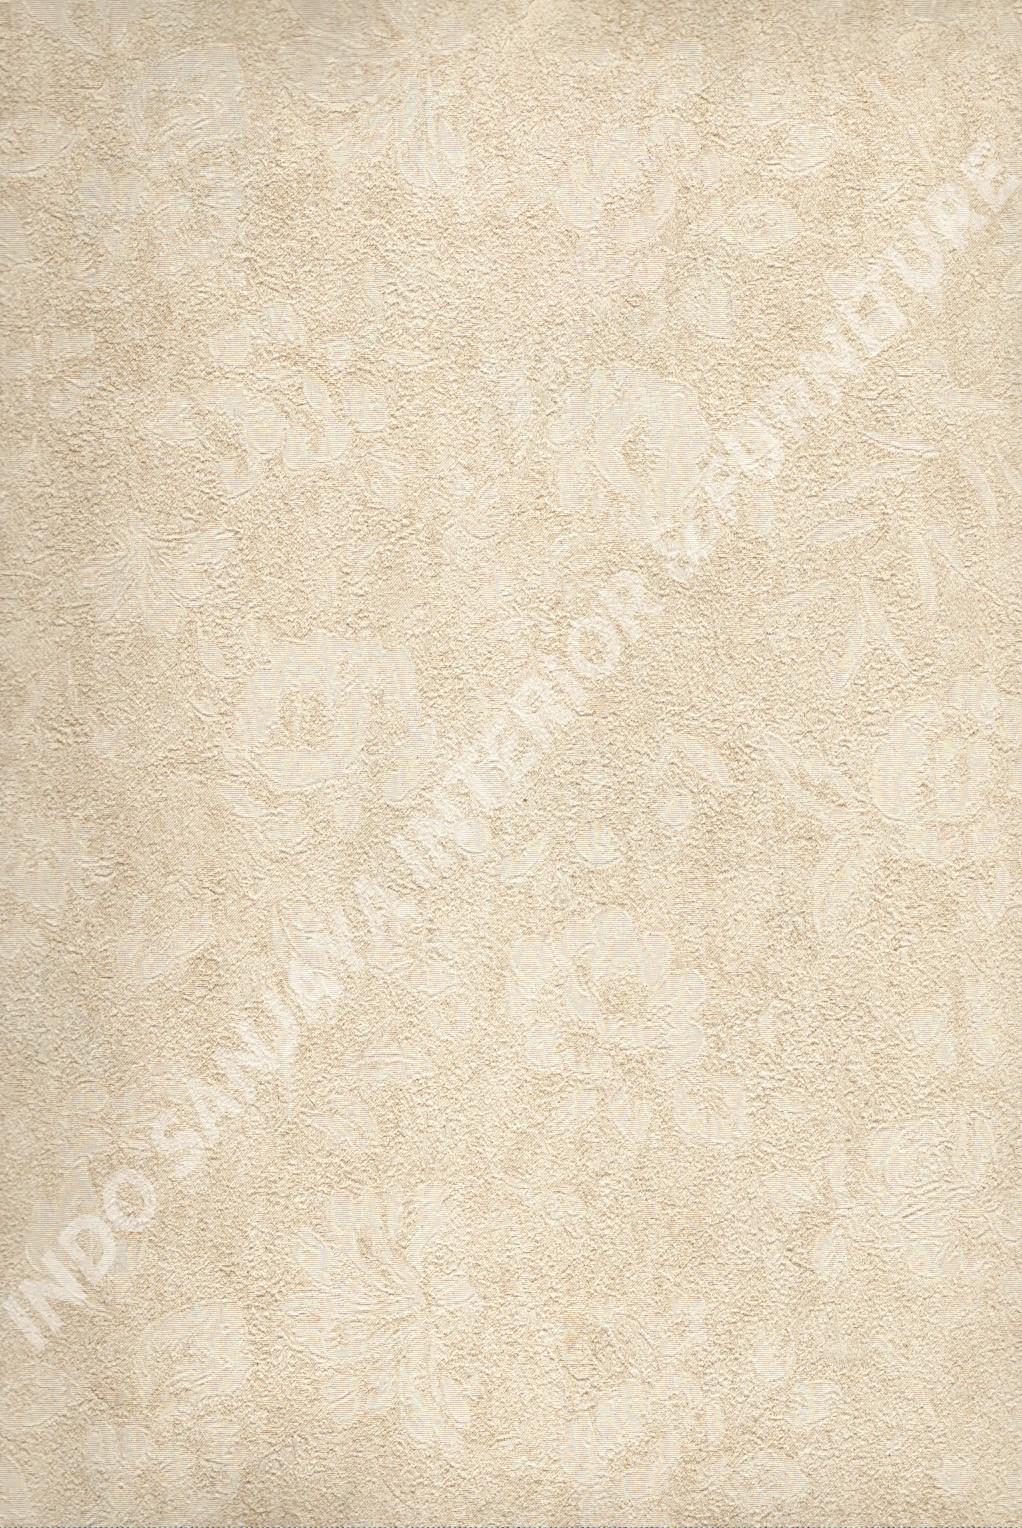 wallpaper   Wallpaper Minimalis Polos 51015-2:51015-2 corak  warna